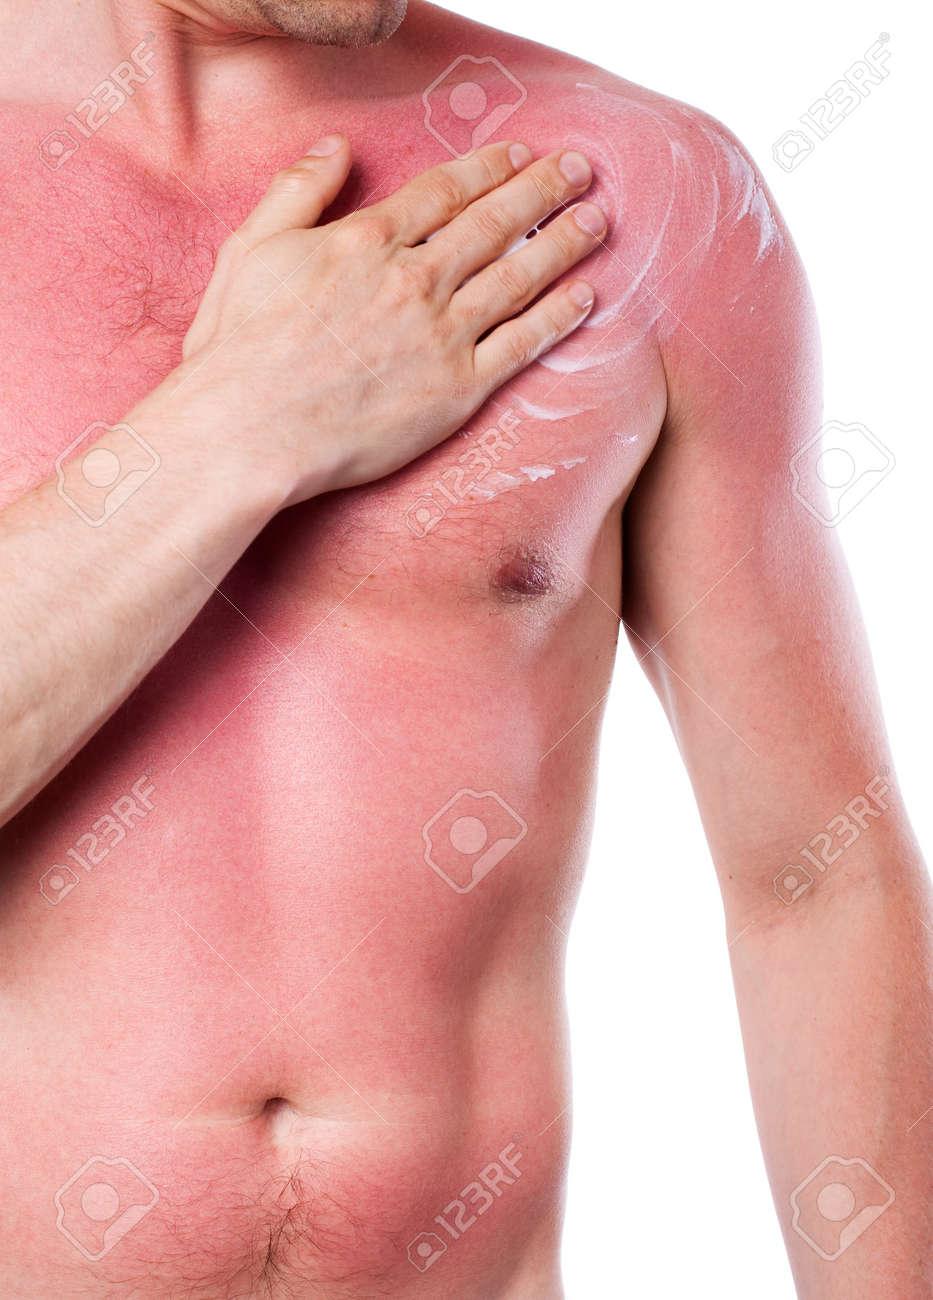 Man with a sunburn isolated on white background Stock Photo - 19973603